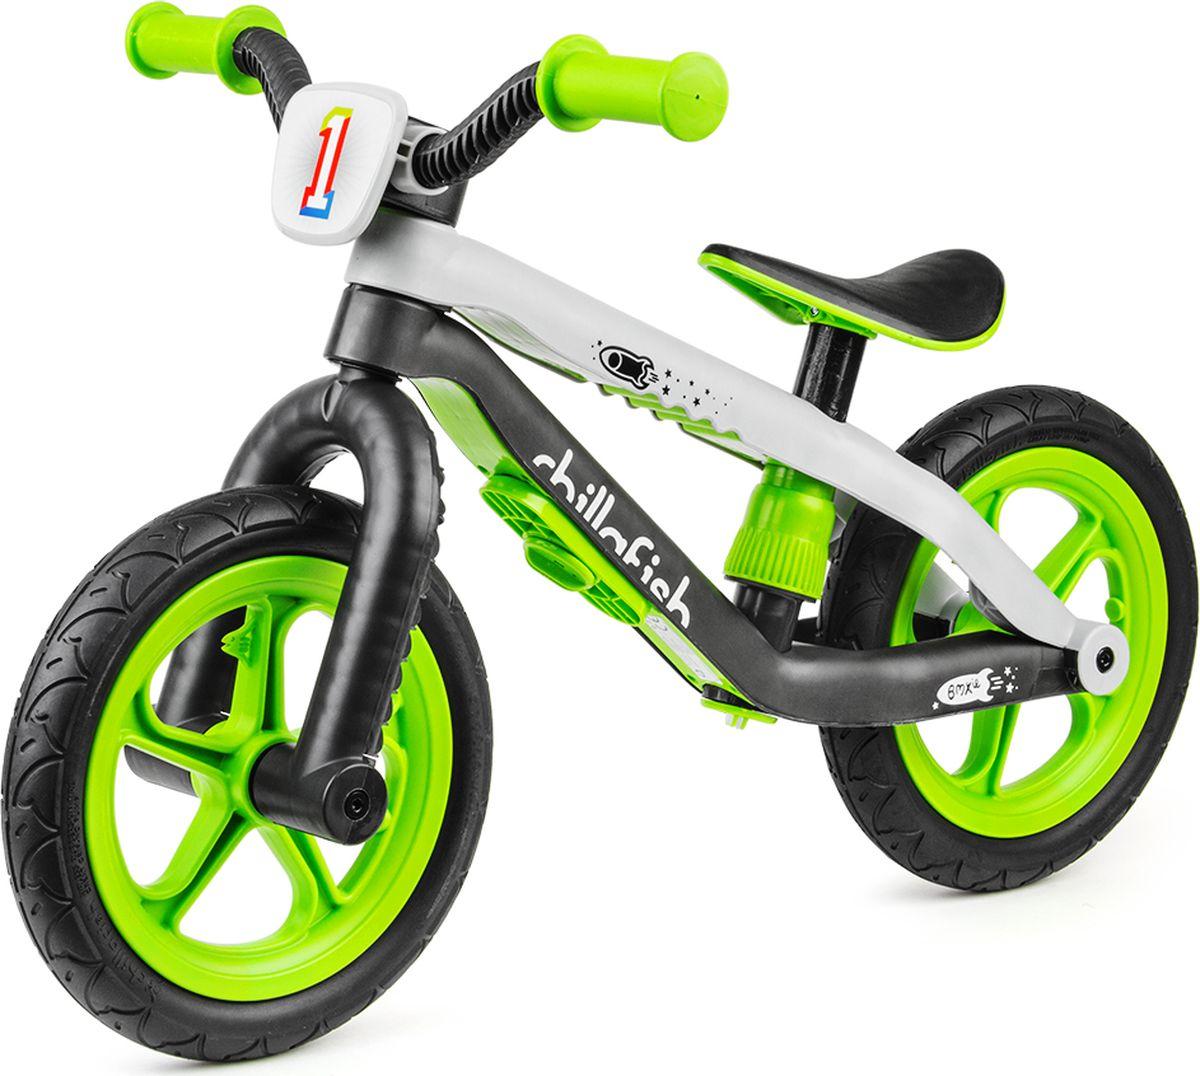 Chillafish Беговел детский BMXie-RS цвет зеленый -  Беговелы